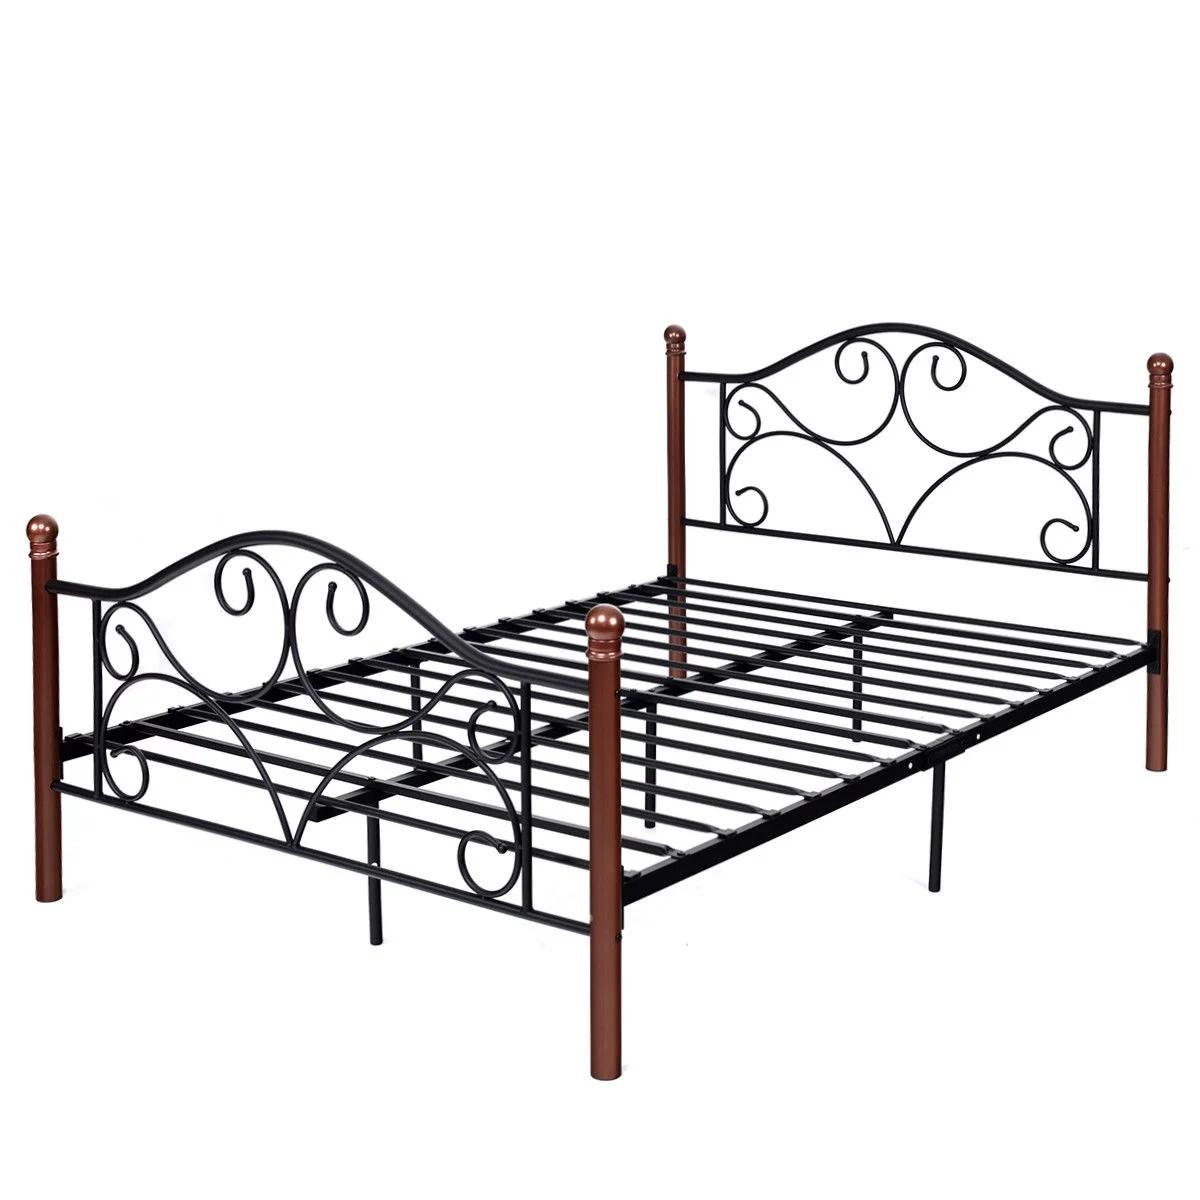 Costway Full Size Steel Bed Frame Platform Stable Metal